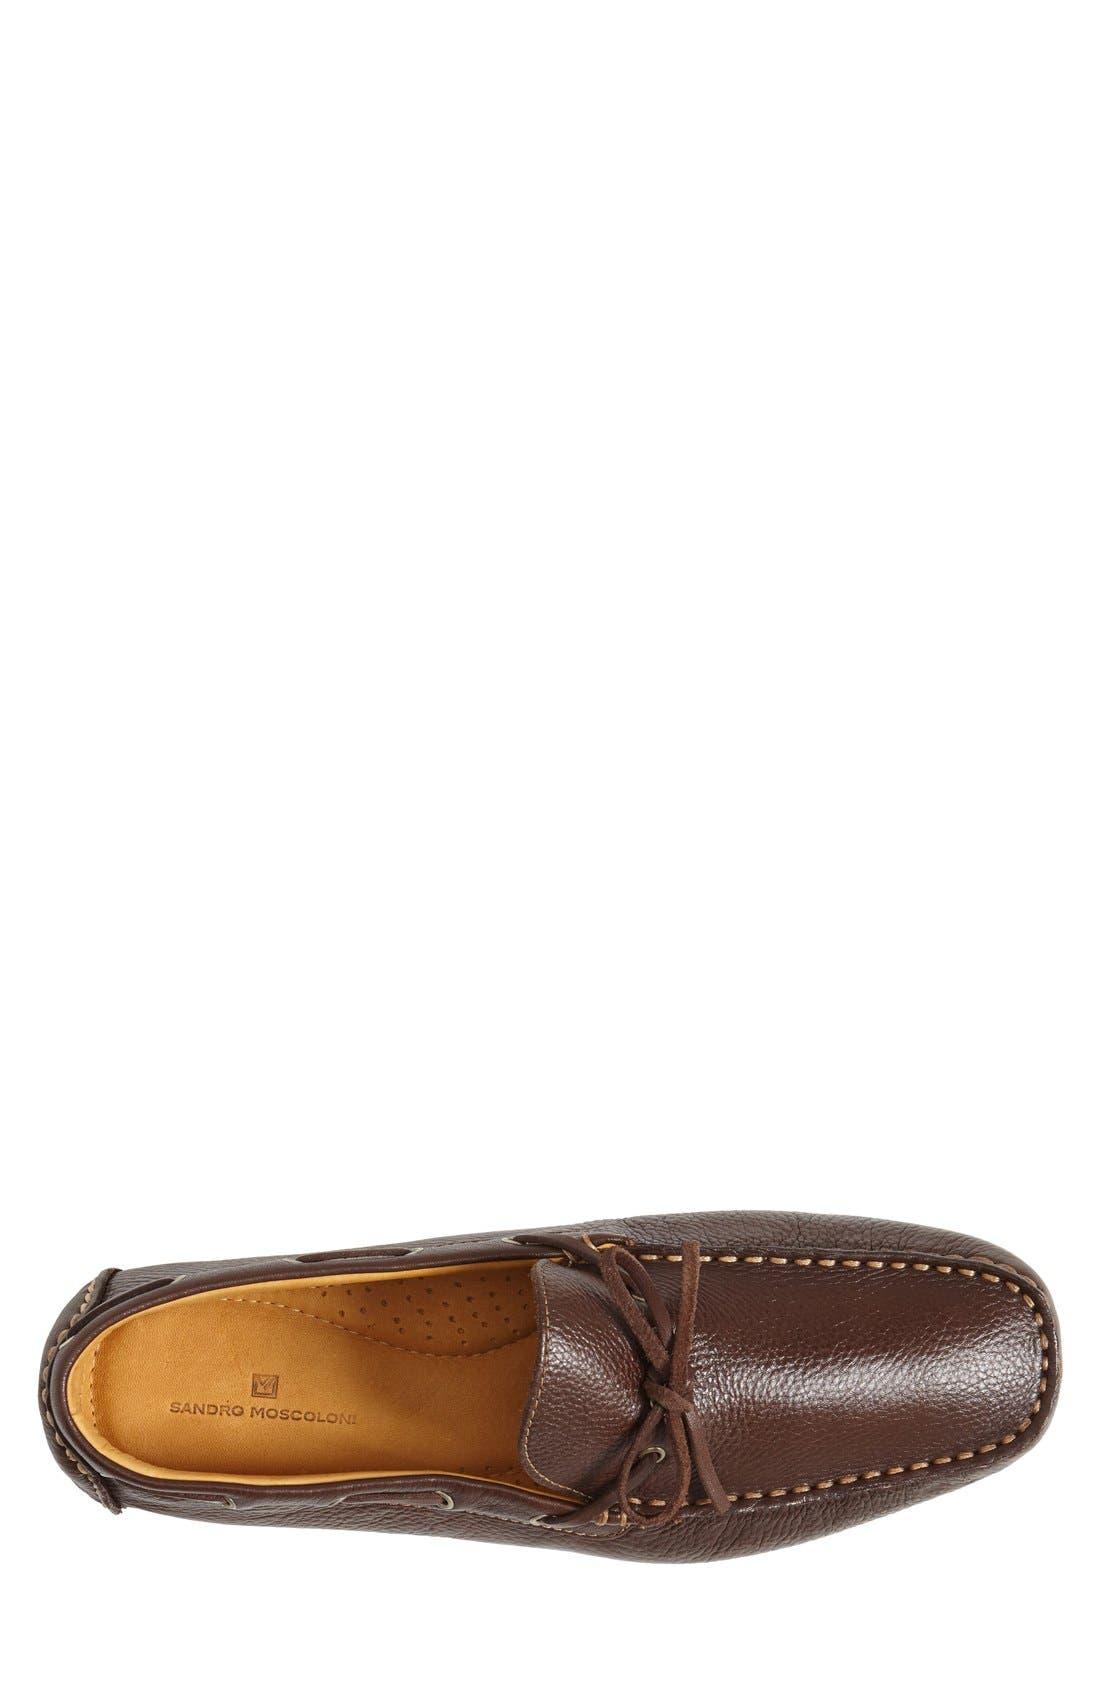 Alternate Image 3  - Sandro Moscoloni 'Perry' Driving Shoe (Men)